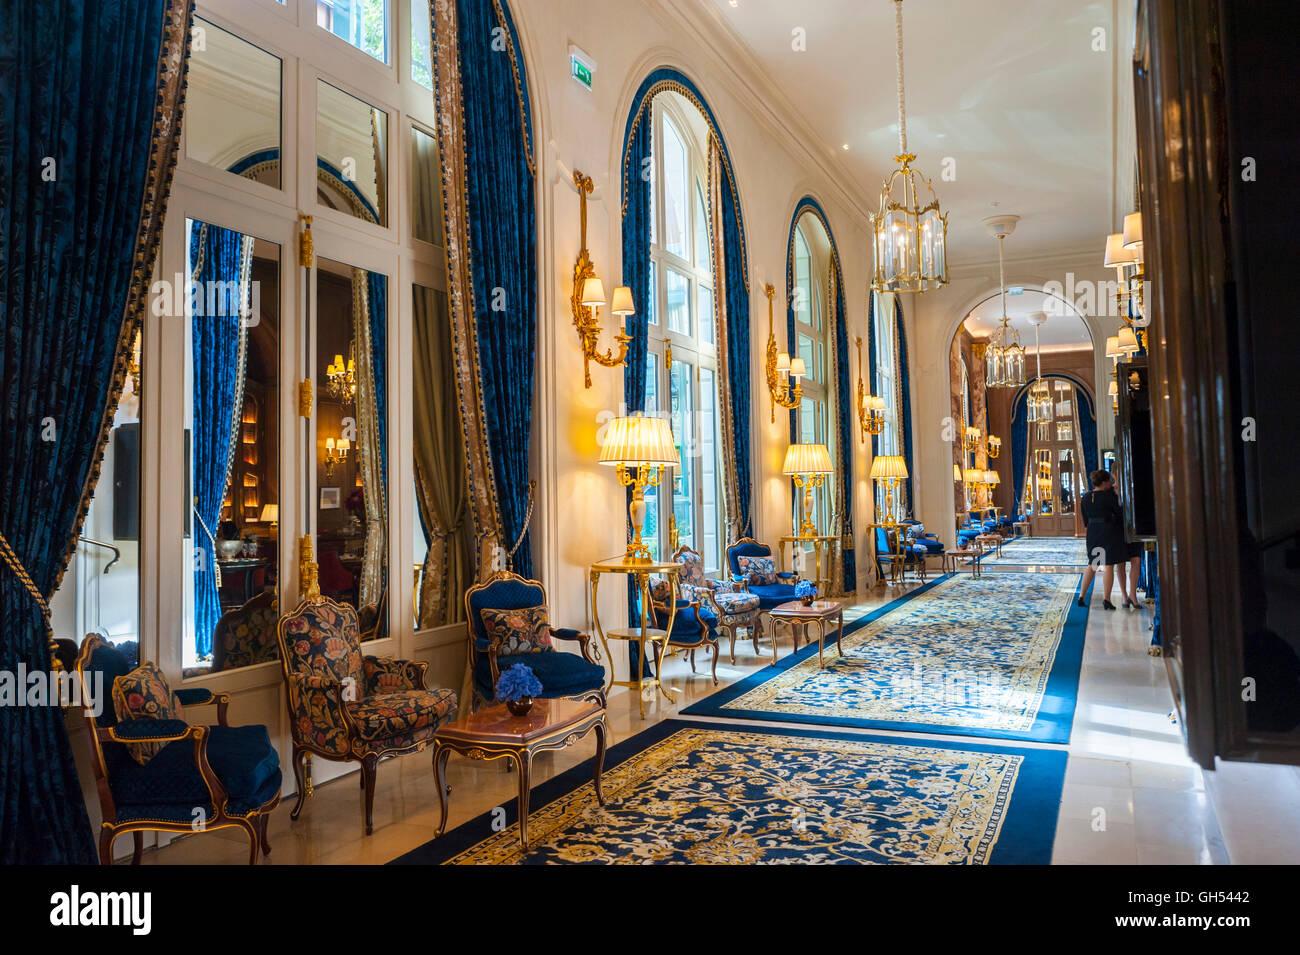 Swell Paris France Inside The Hotel Ritz Luxury Interior Download Free Architecture Designs Crovemadebymaigaardcom